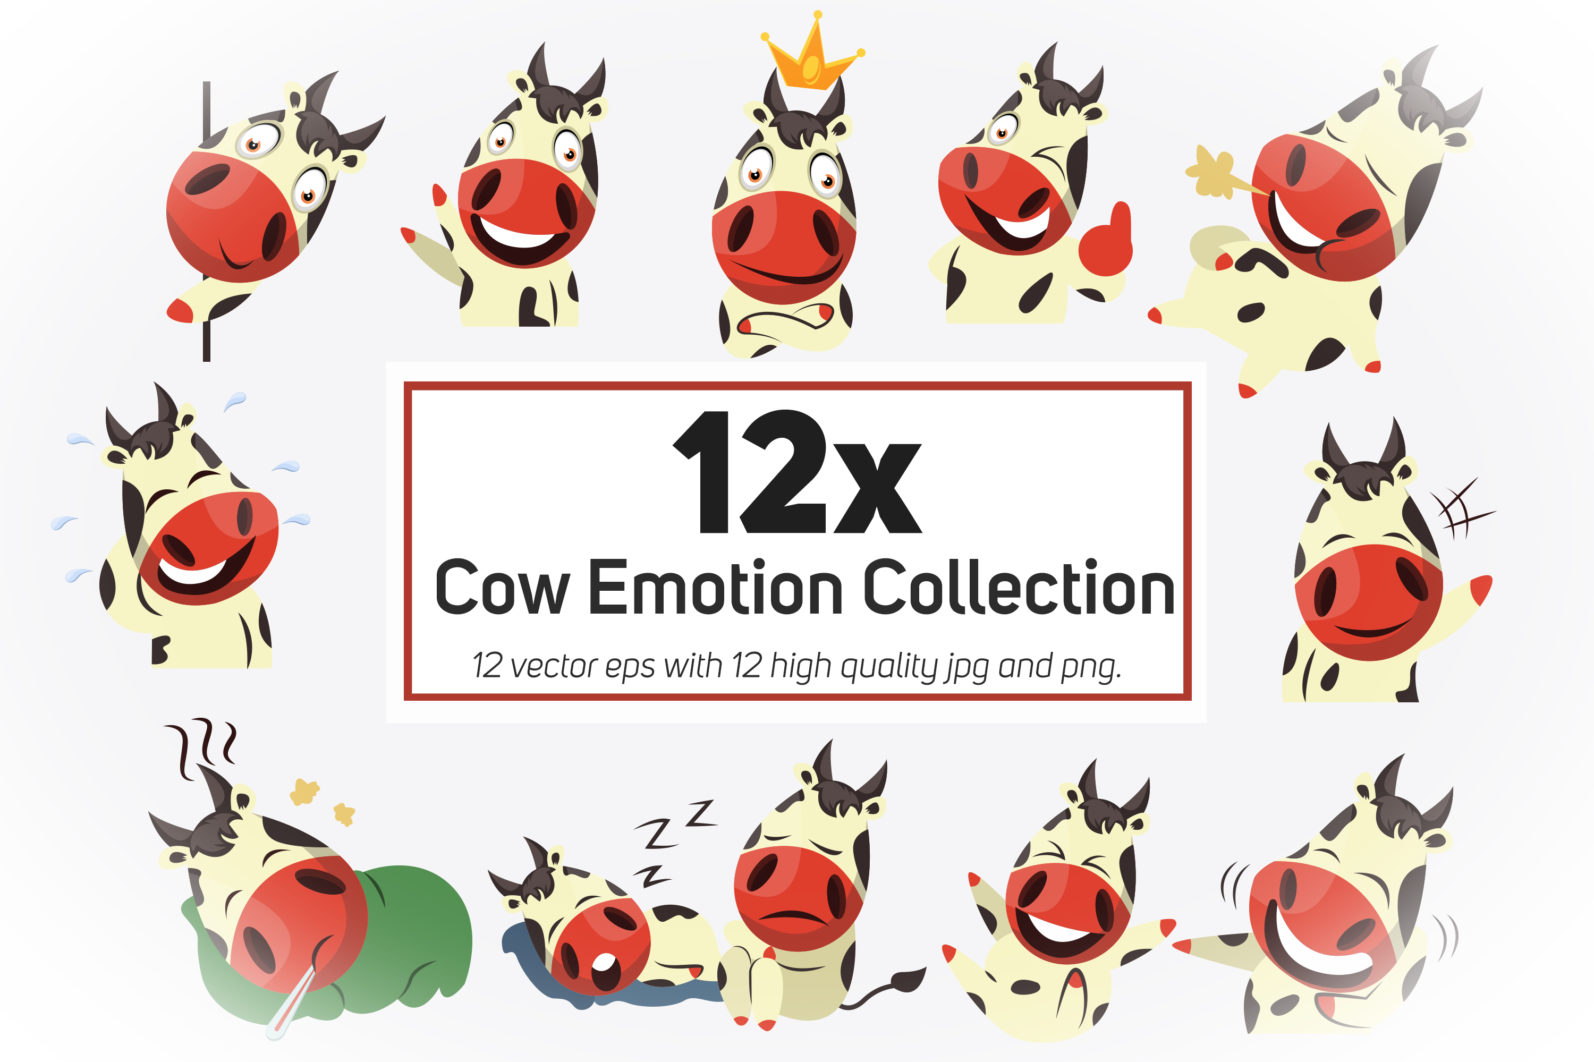 12x Cow Emotion Collection illustration. - Cow Emotion Bundle Presentation MAIN 1 scaled -